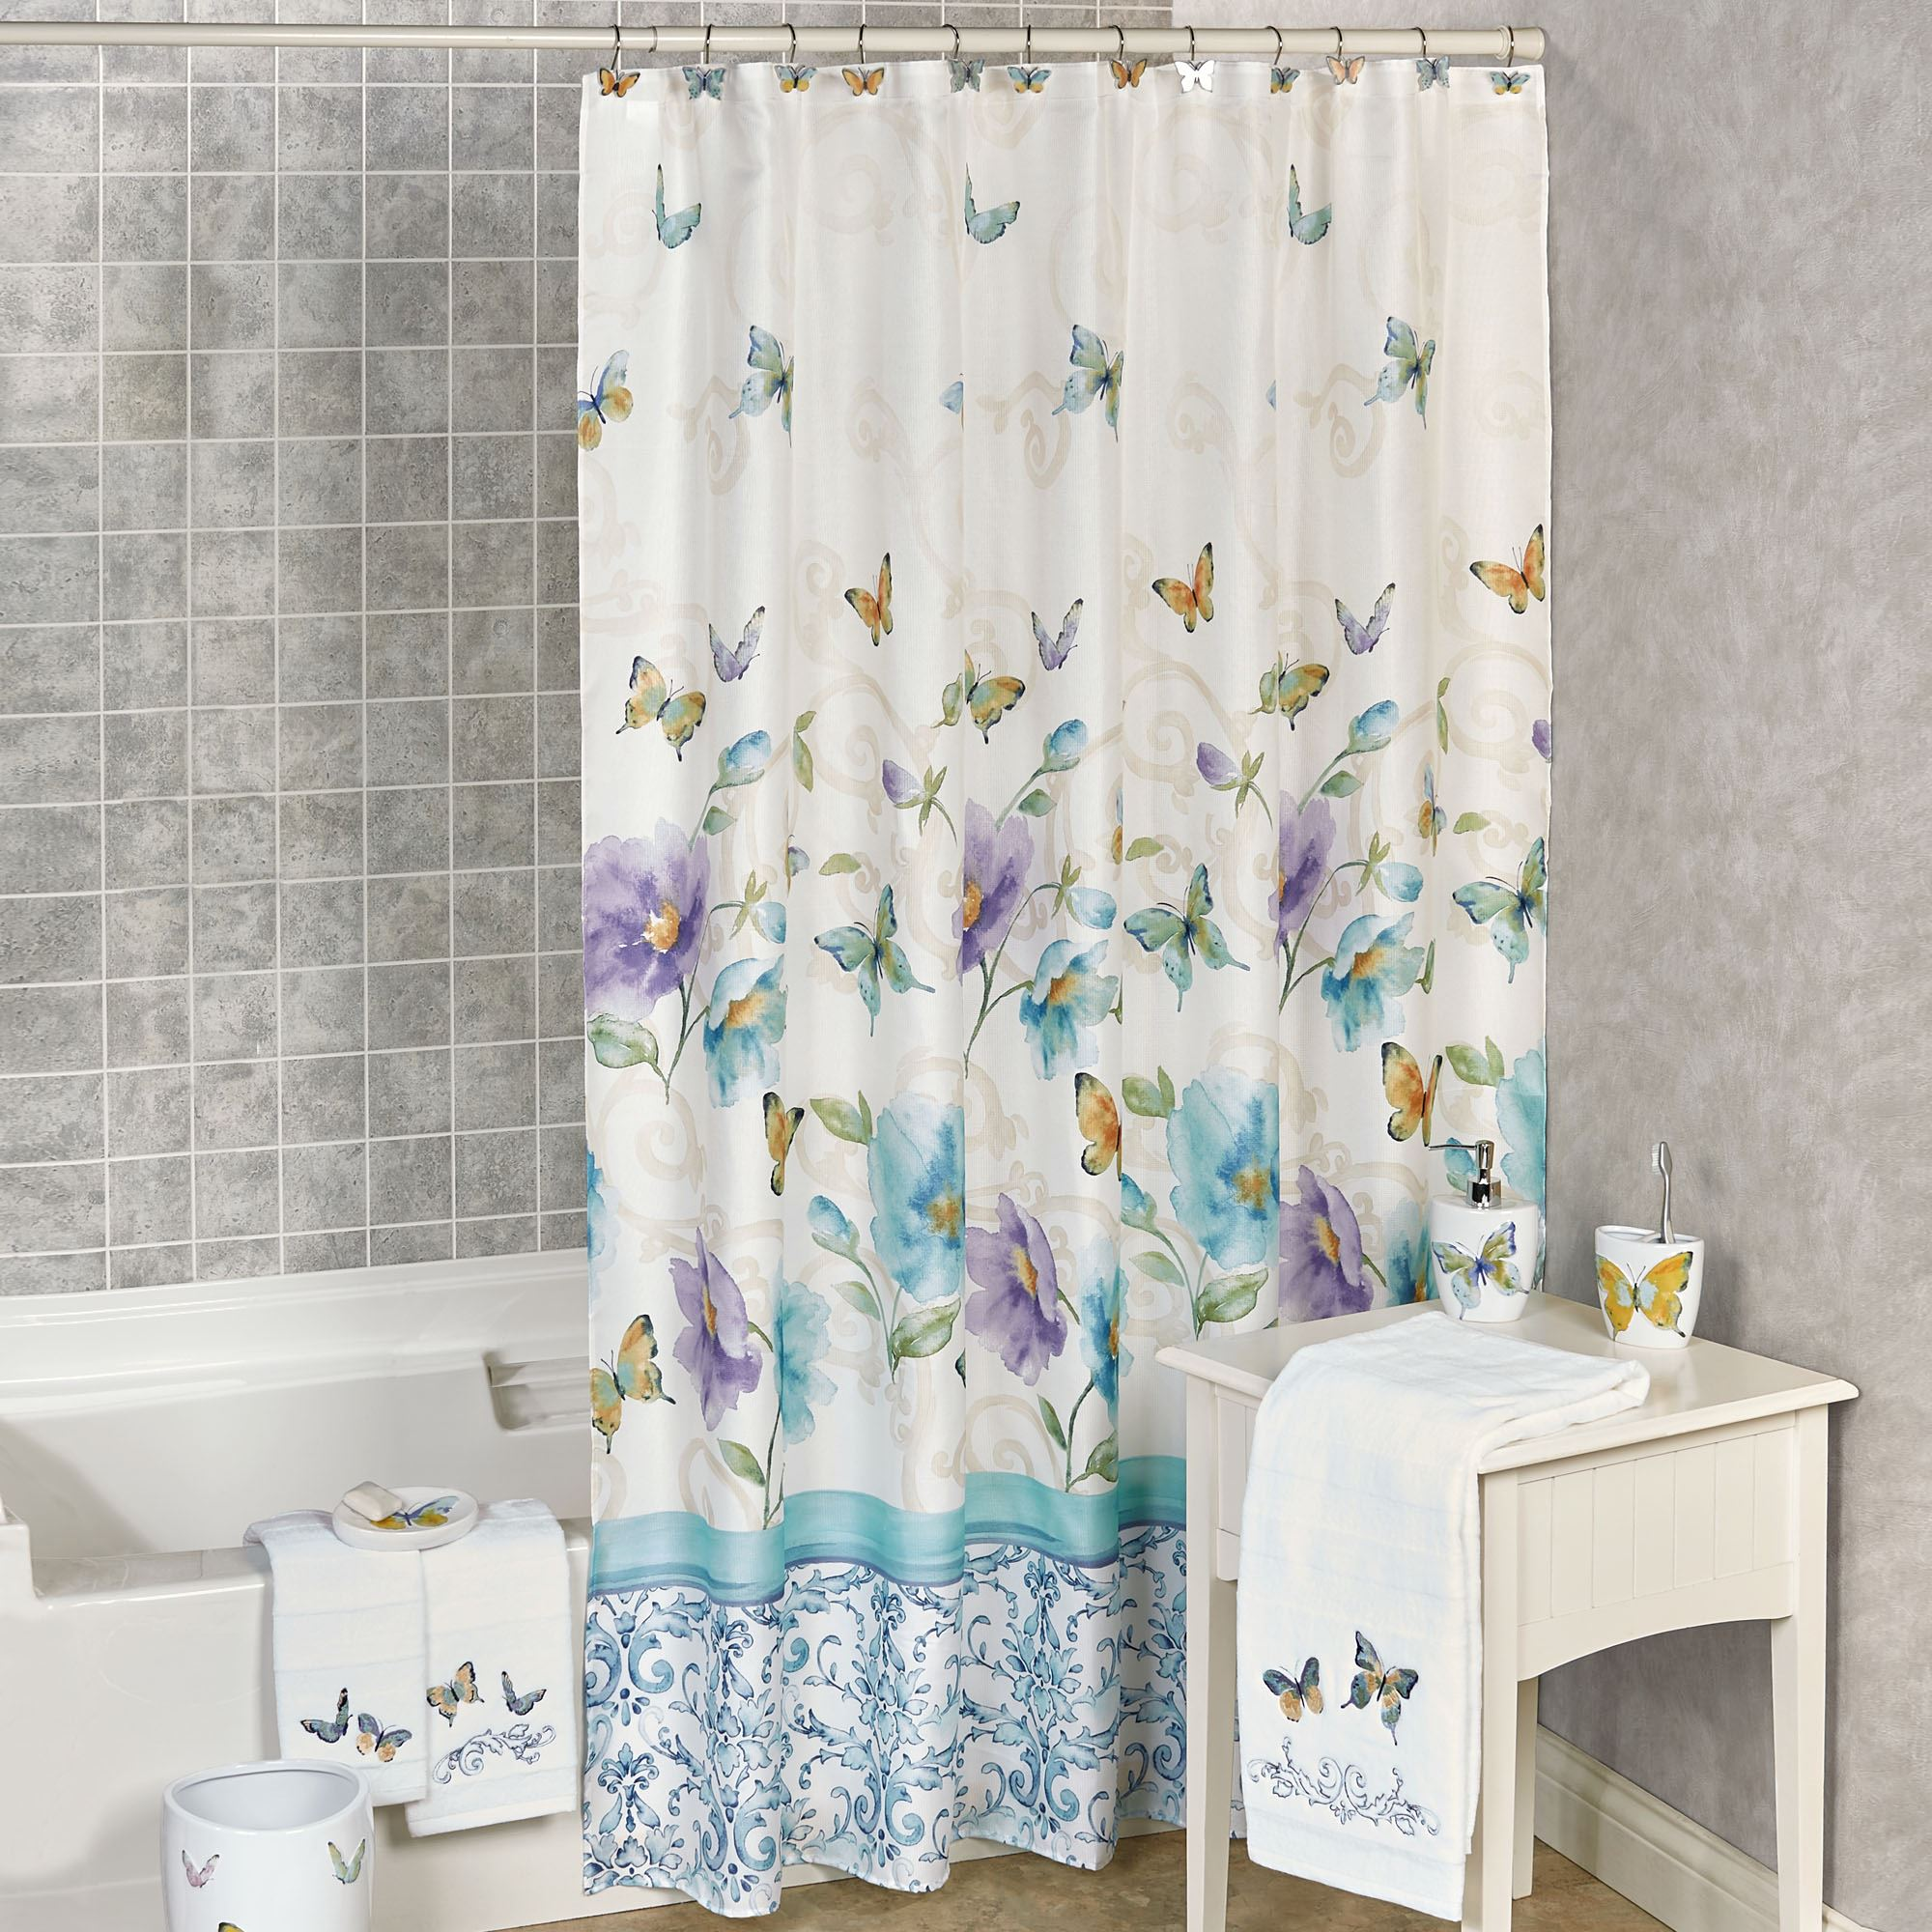 Fullsize Of Butterfly Shower Curtain